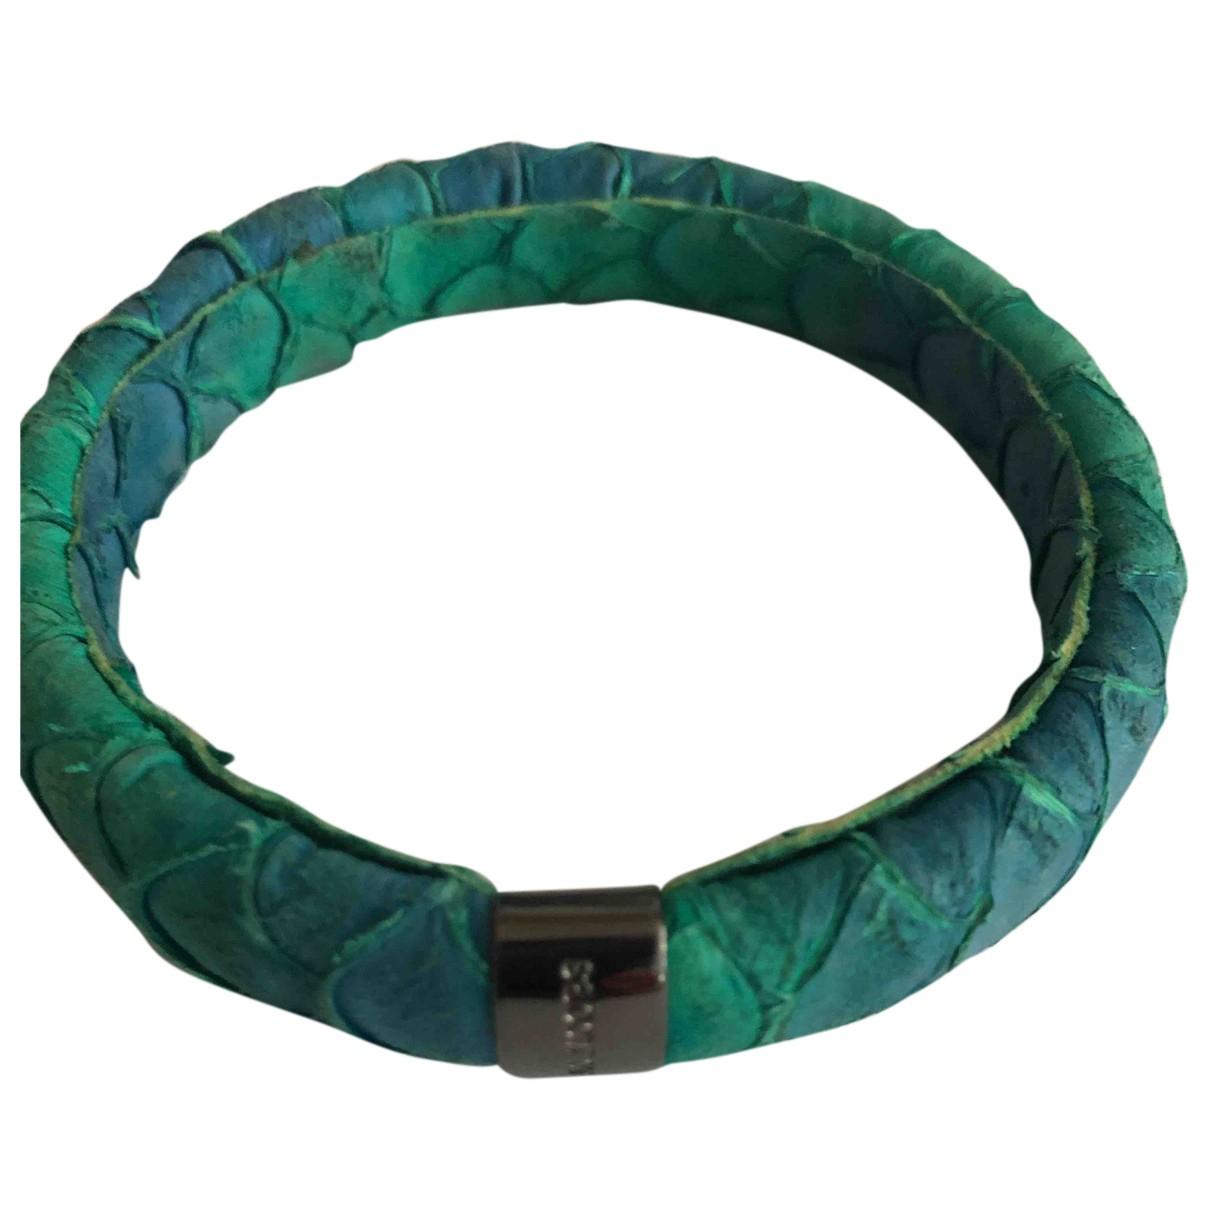 Marc Jacobs N Green Leather bracelet for Women N